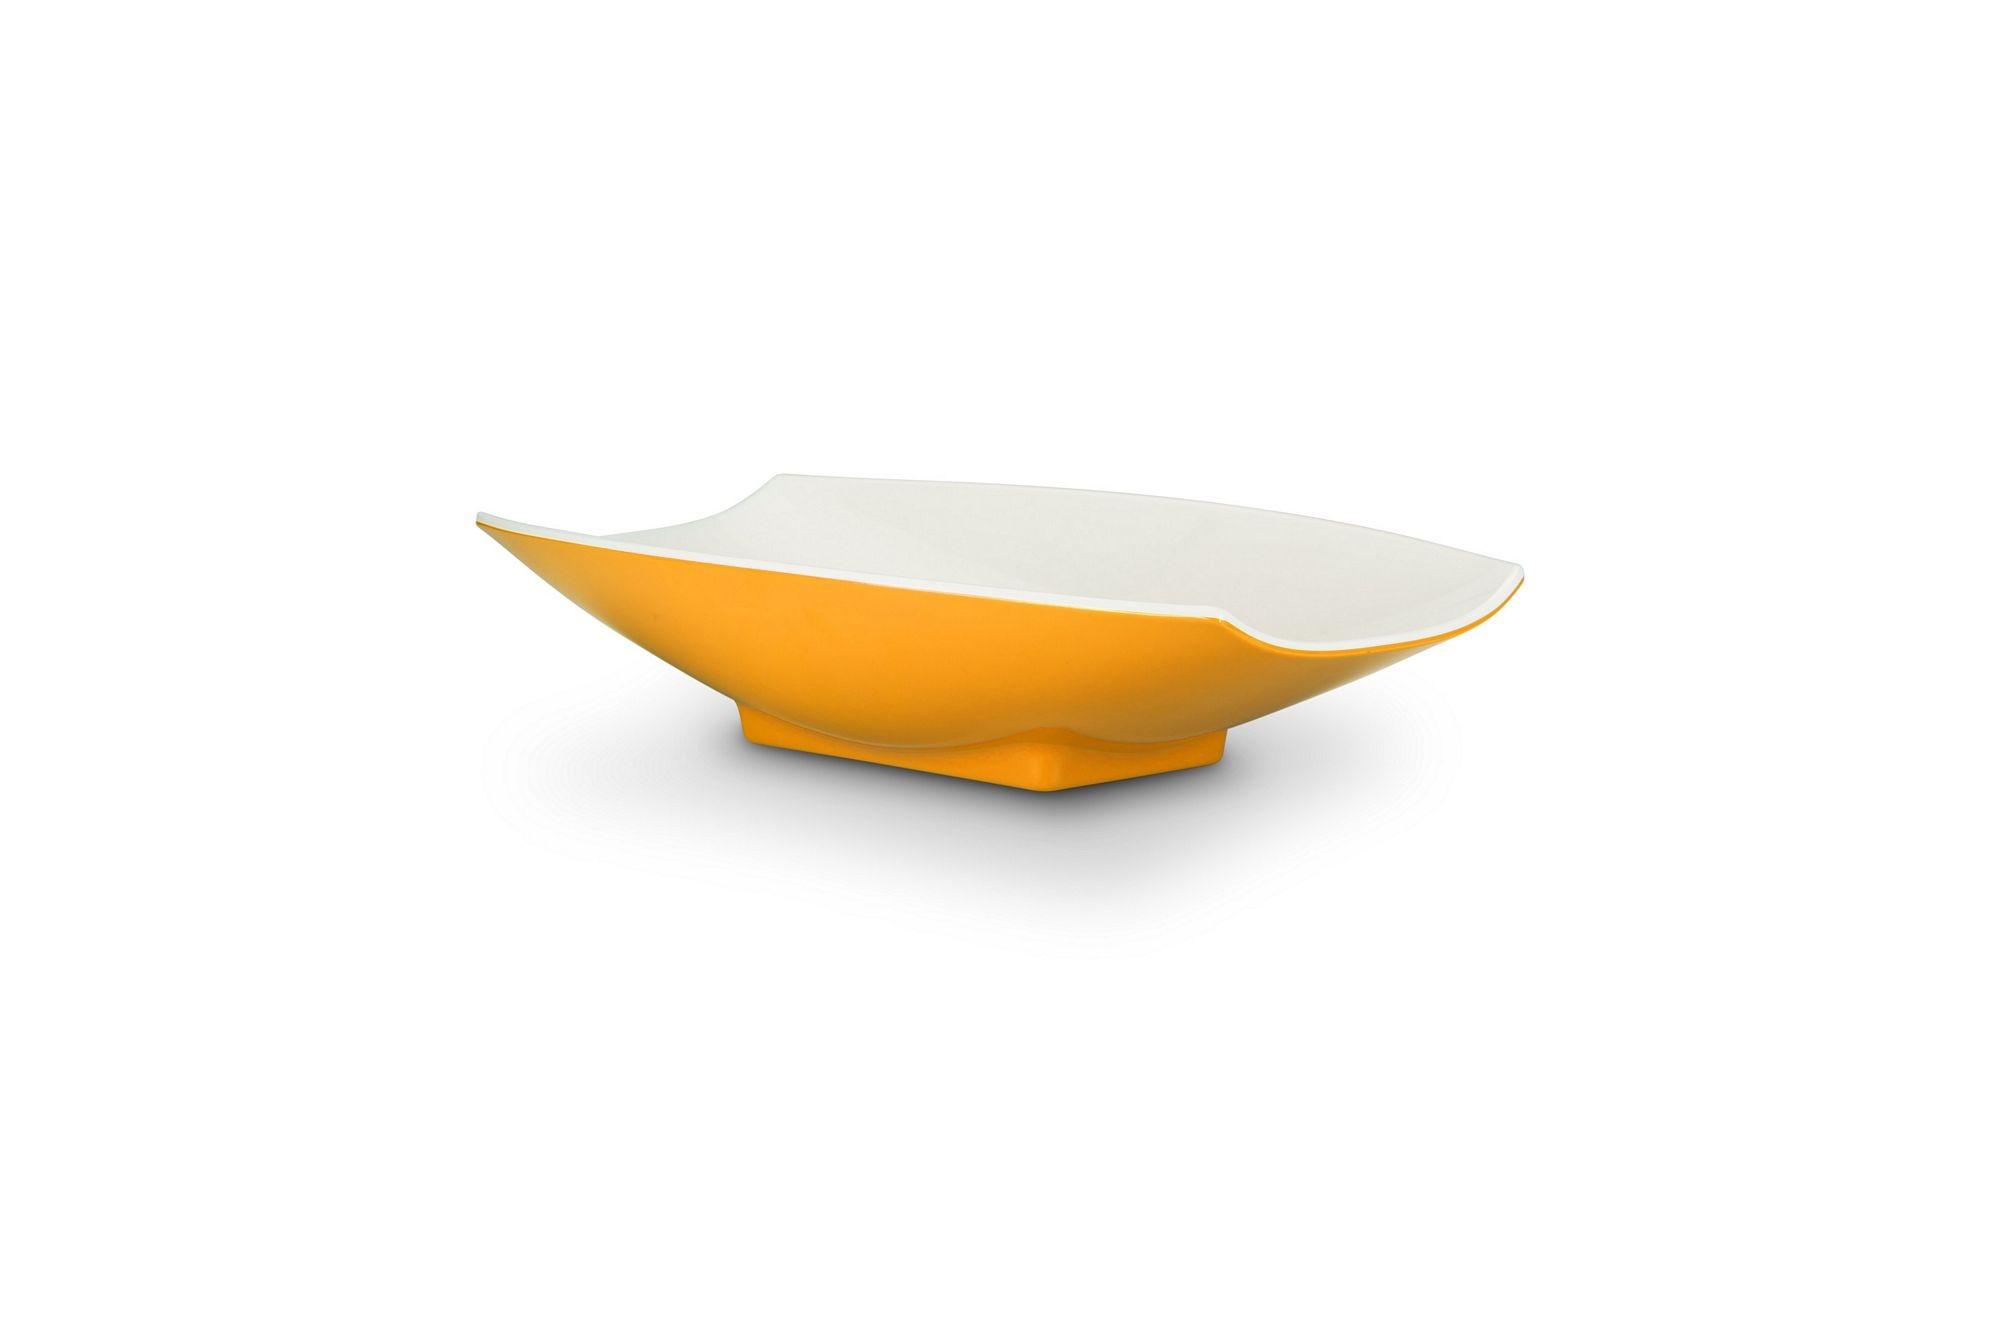 Bon Chef 53703-2ToneYellow Melamine Curves Bowl, Yellow Outside/White Inside 1 Qt.